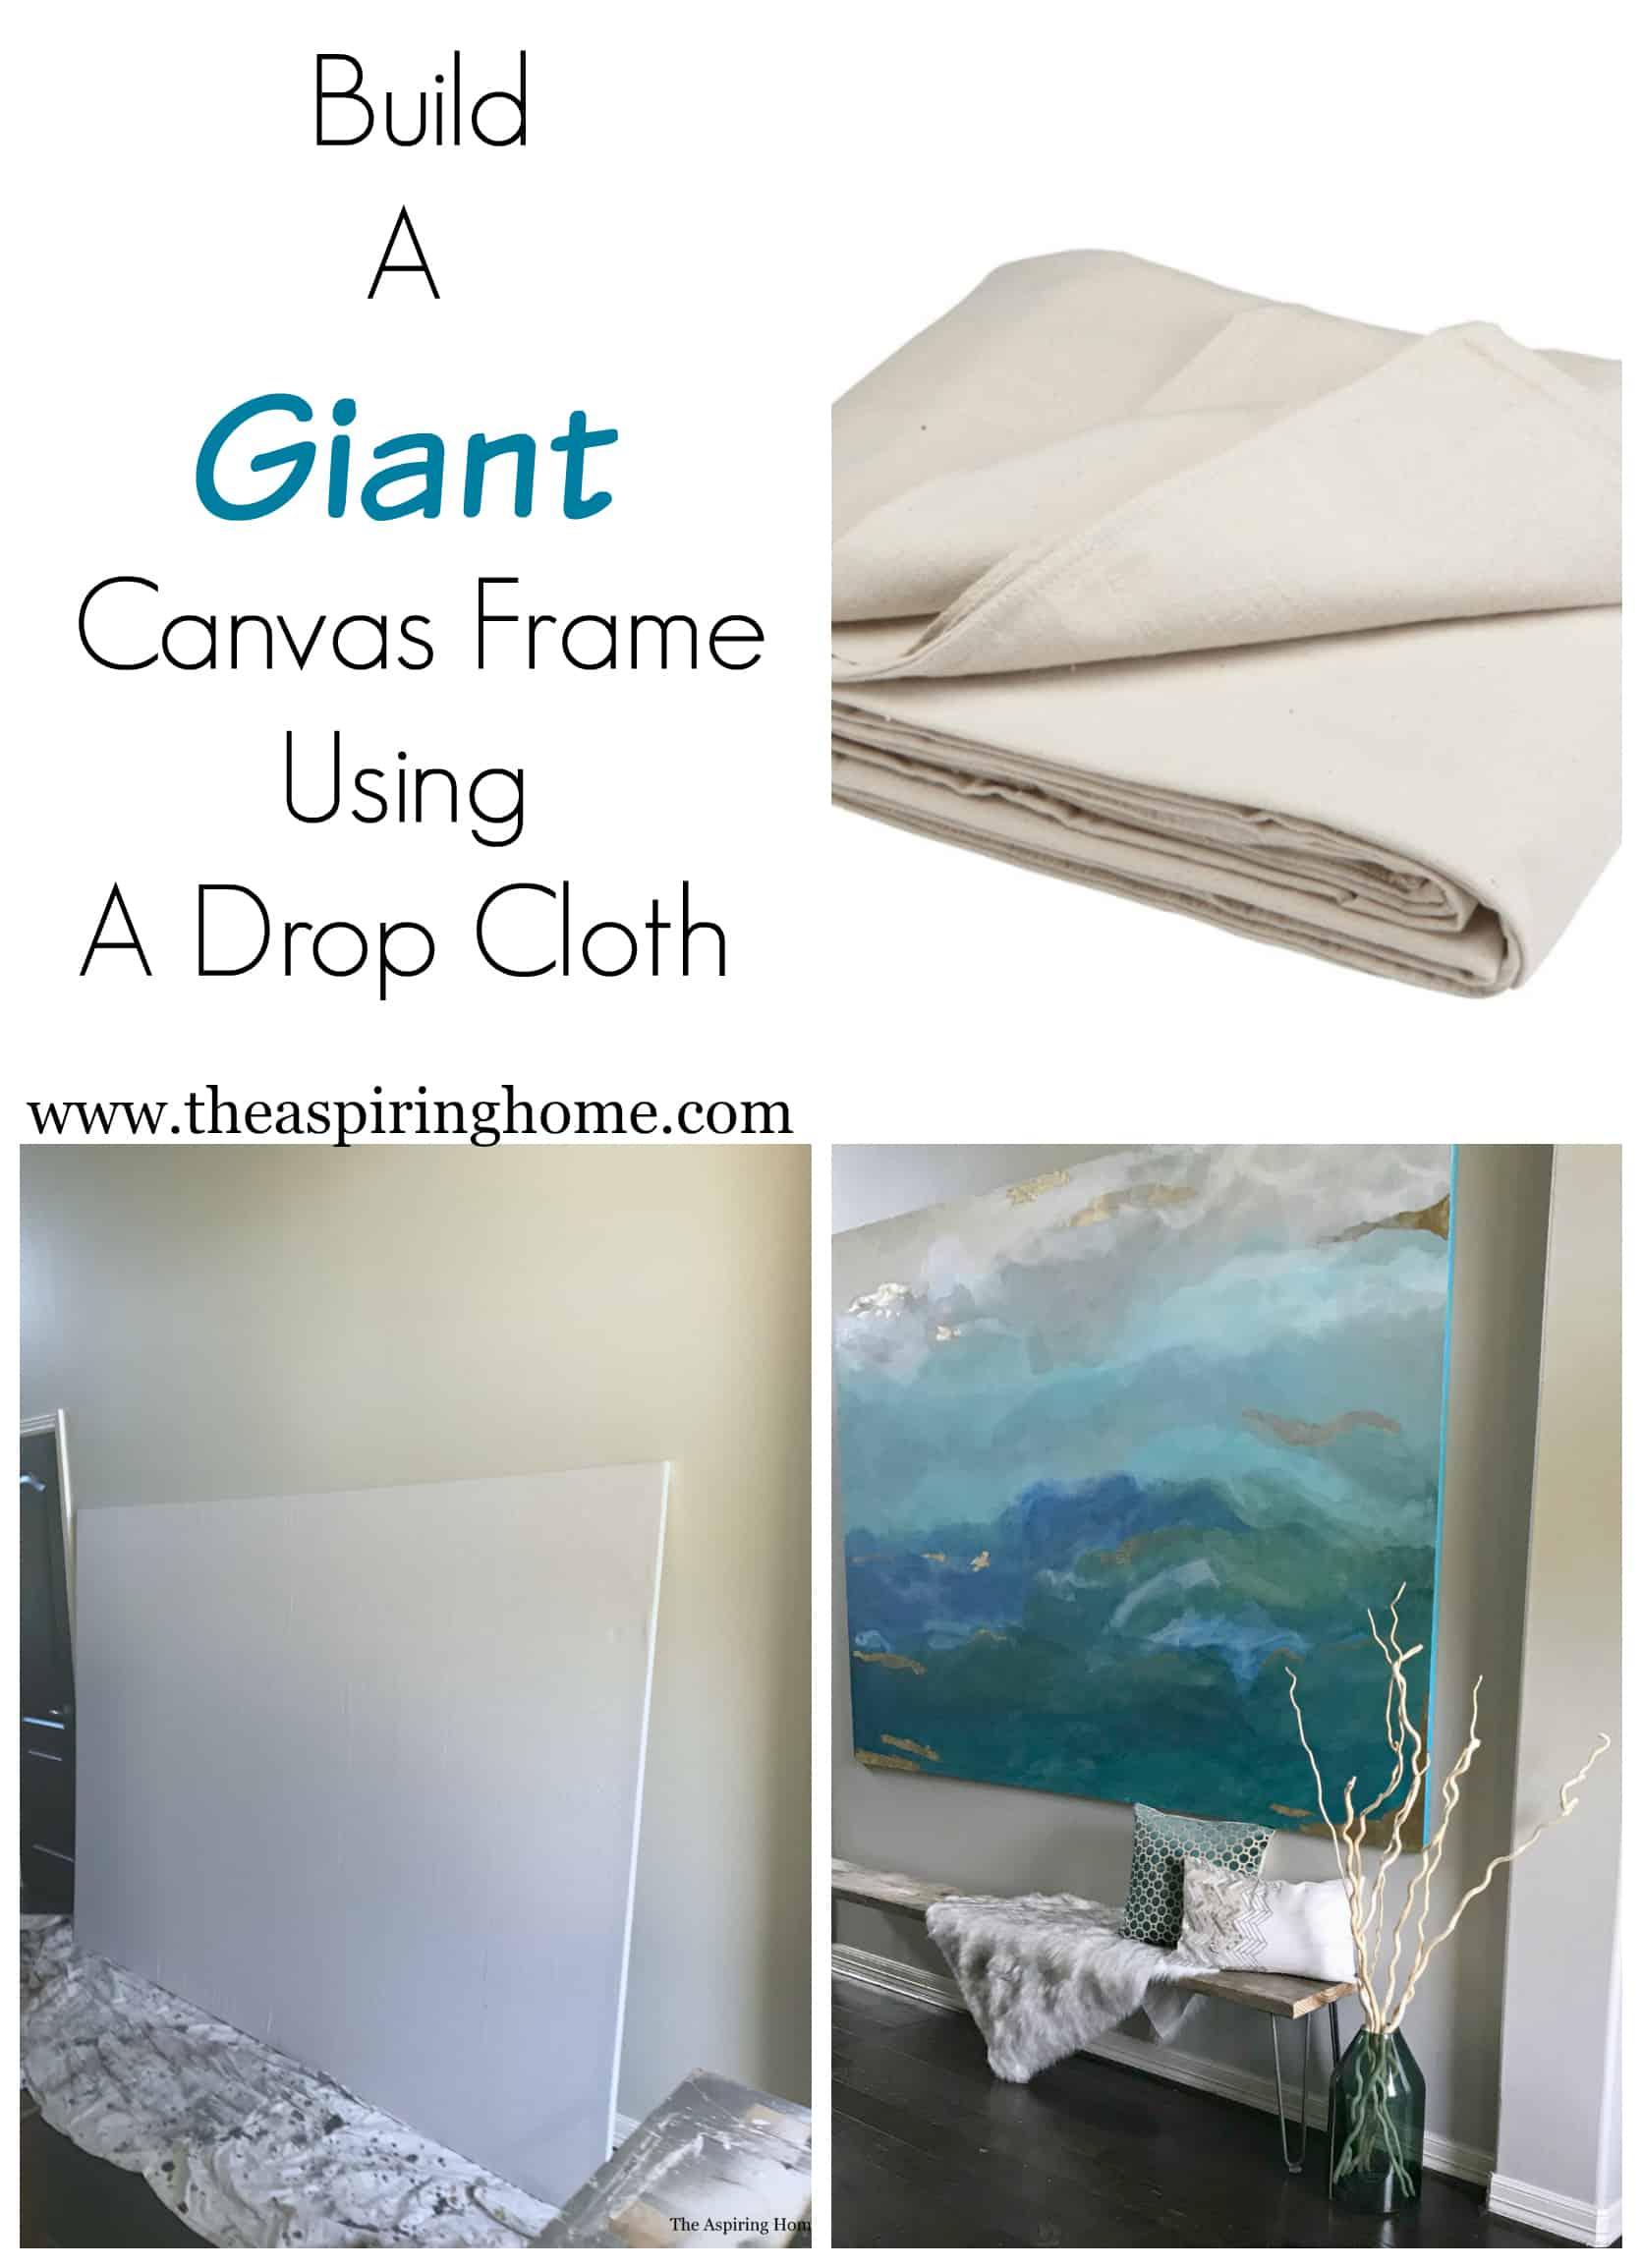 Build a Giant DIY Canvas Frame Using a Drop Cloth | The Aspiring Home